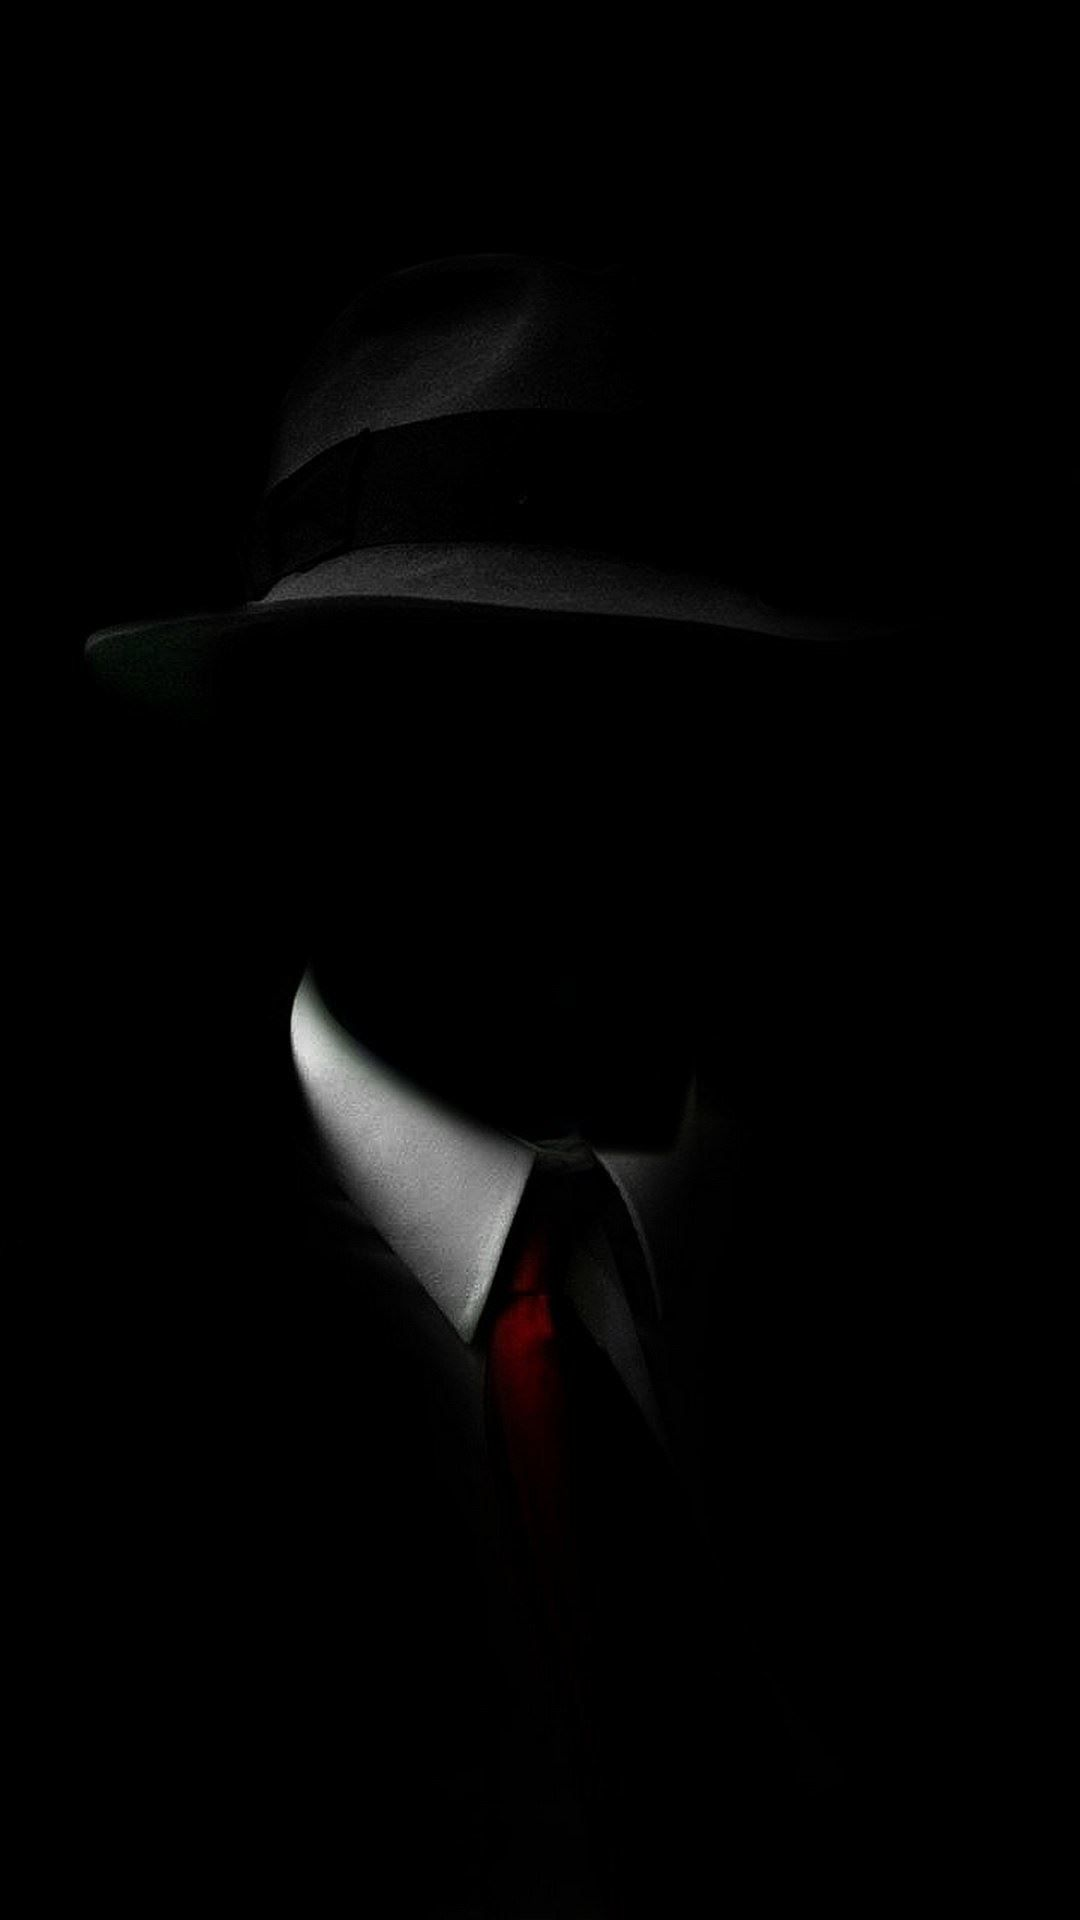 Shadow Man Black Suit Hat Red Tie Iphone 7 Wallpaper Iphone 6 8